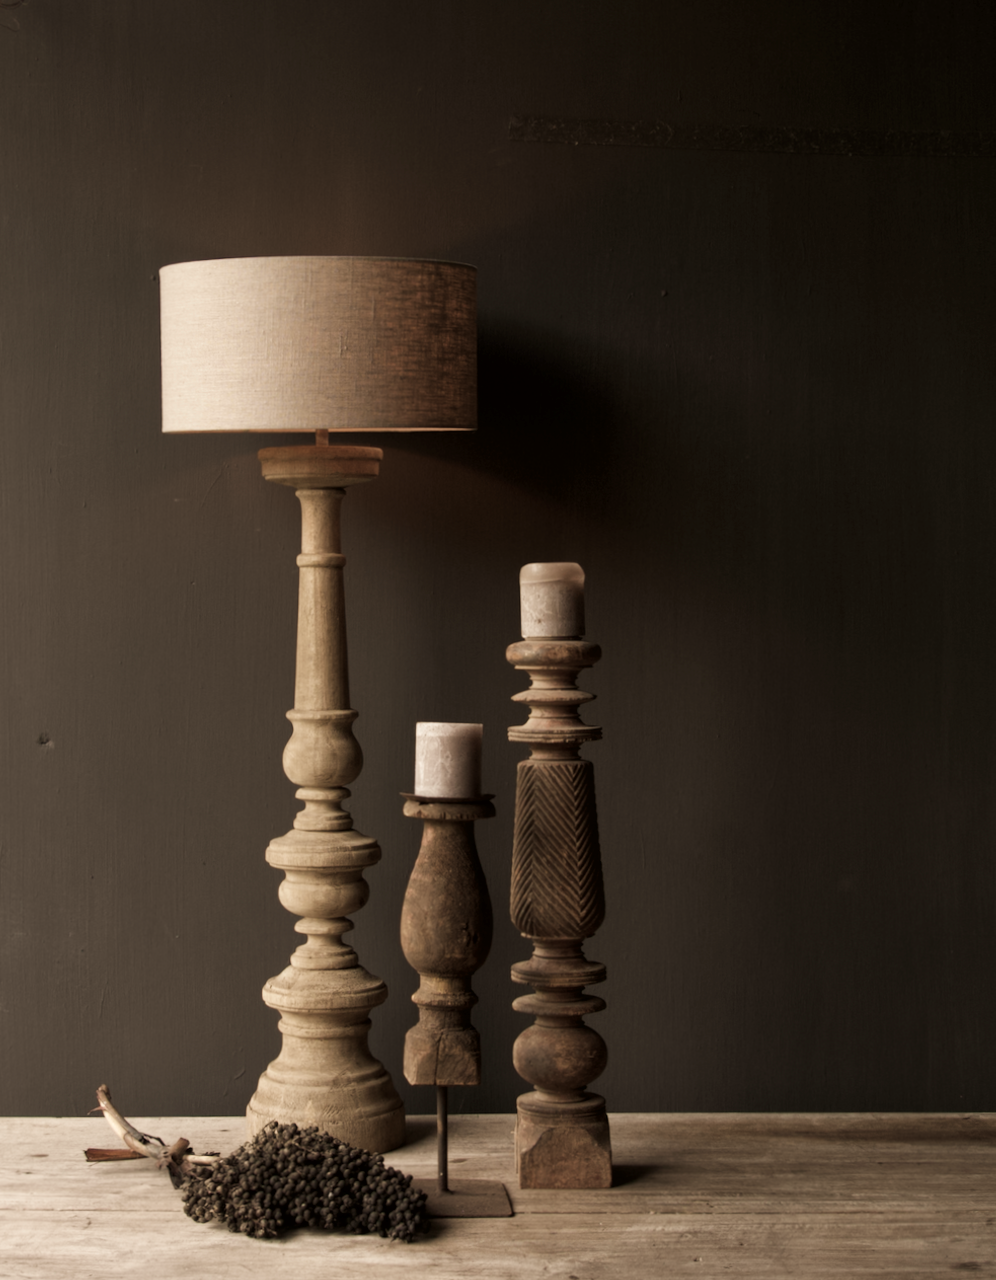 Eiken  Houten baluster lamp voet-1